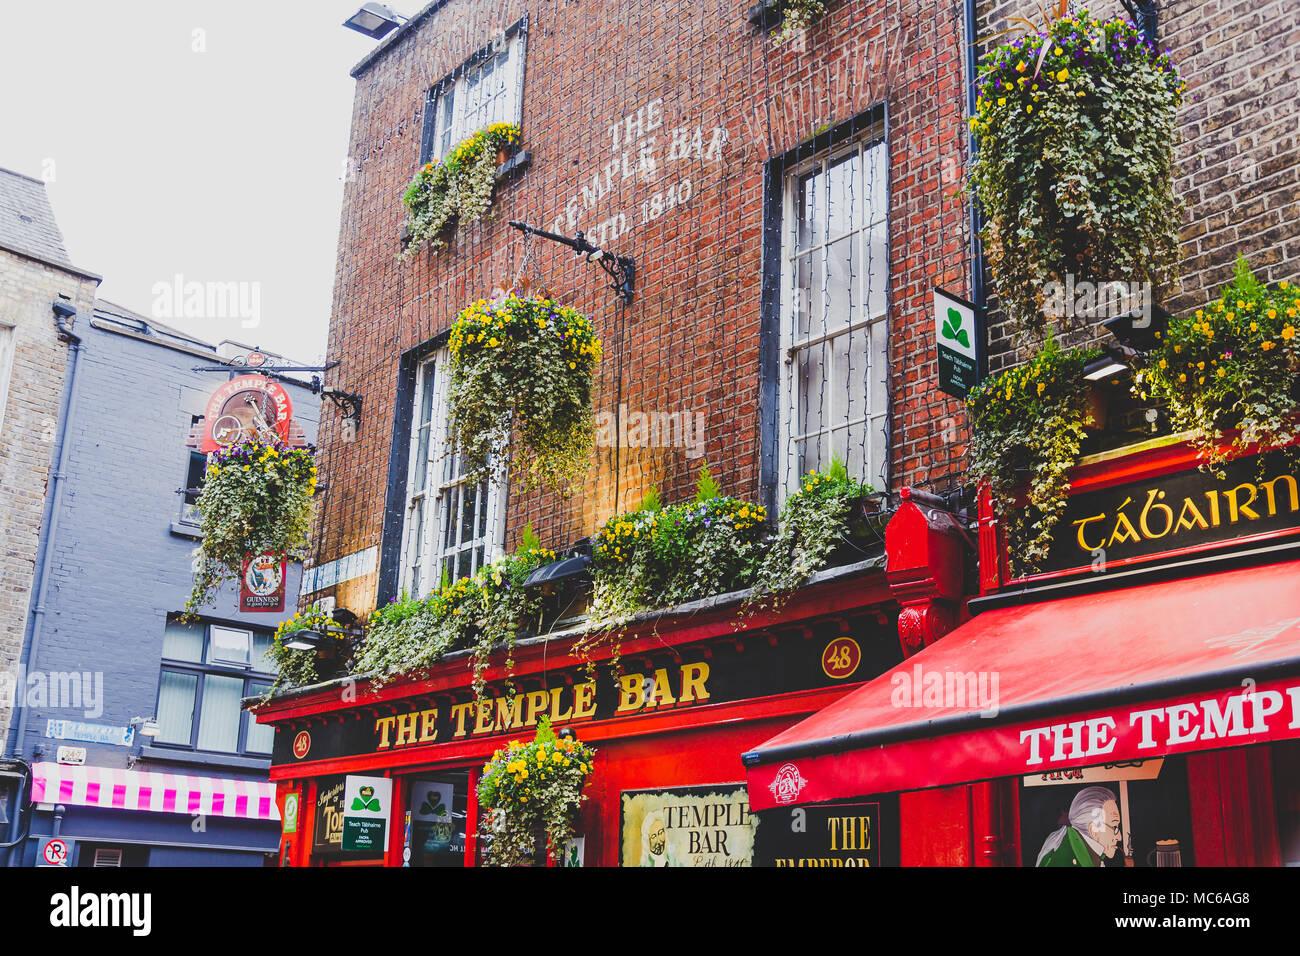 DUBLIN, IRELAND - April 12th, 2018: the Temple Bar pub in Dublin, arguably the most popular traditional Irish pub in Ireland - Stock Image